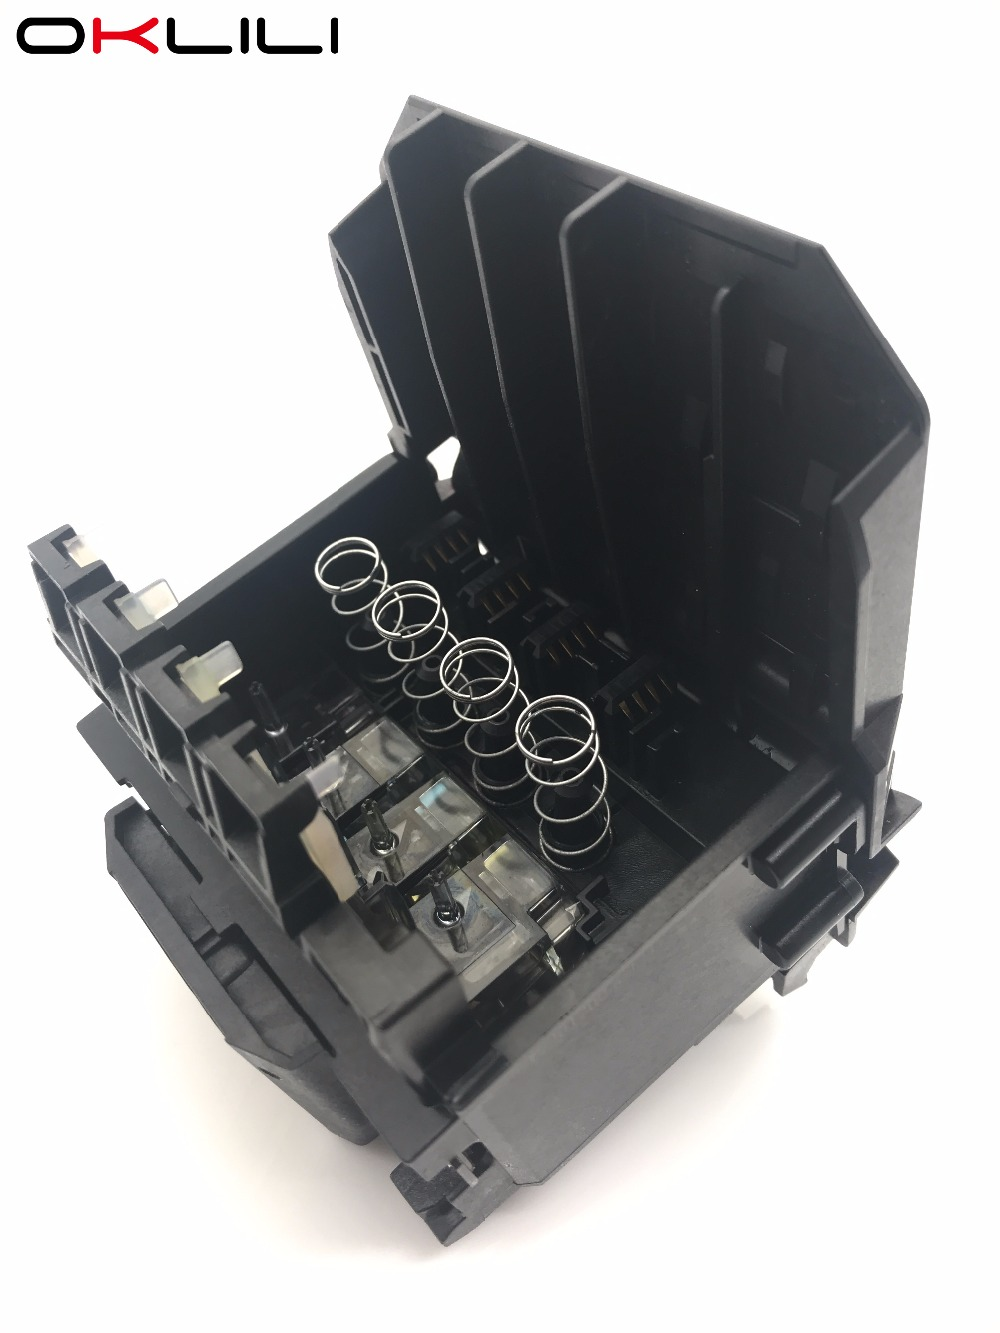 1X CB863 80002A 932 933 932XL 933XL Printhead Printer Print head for HP Officejet 6060 6060e